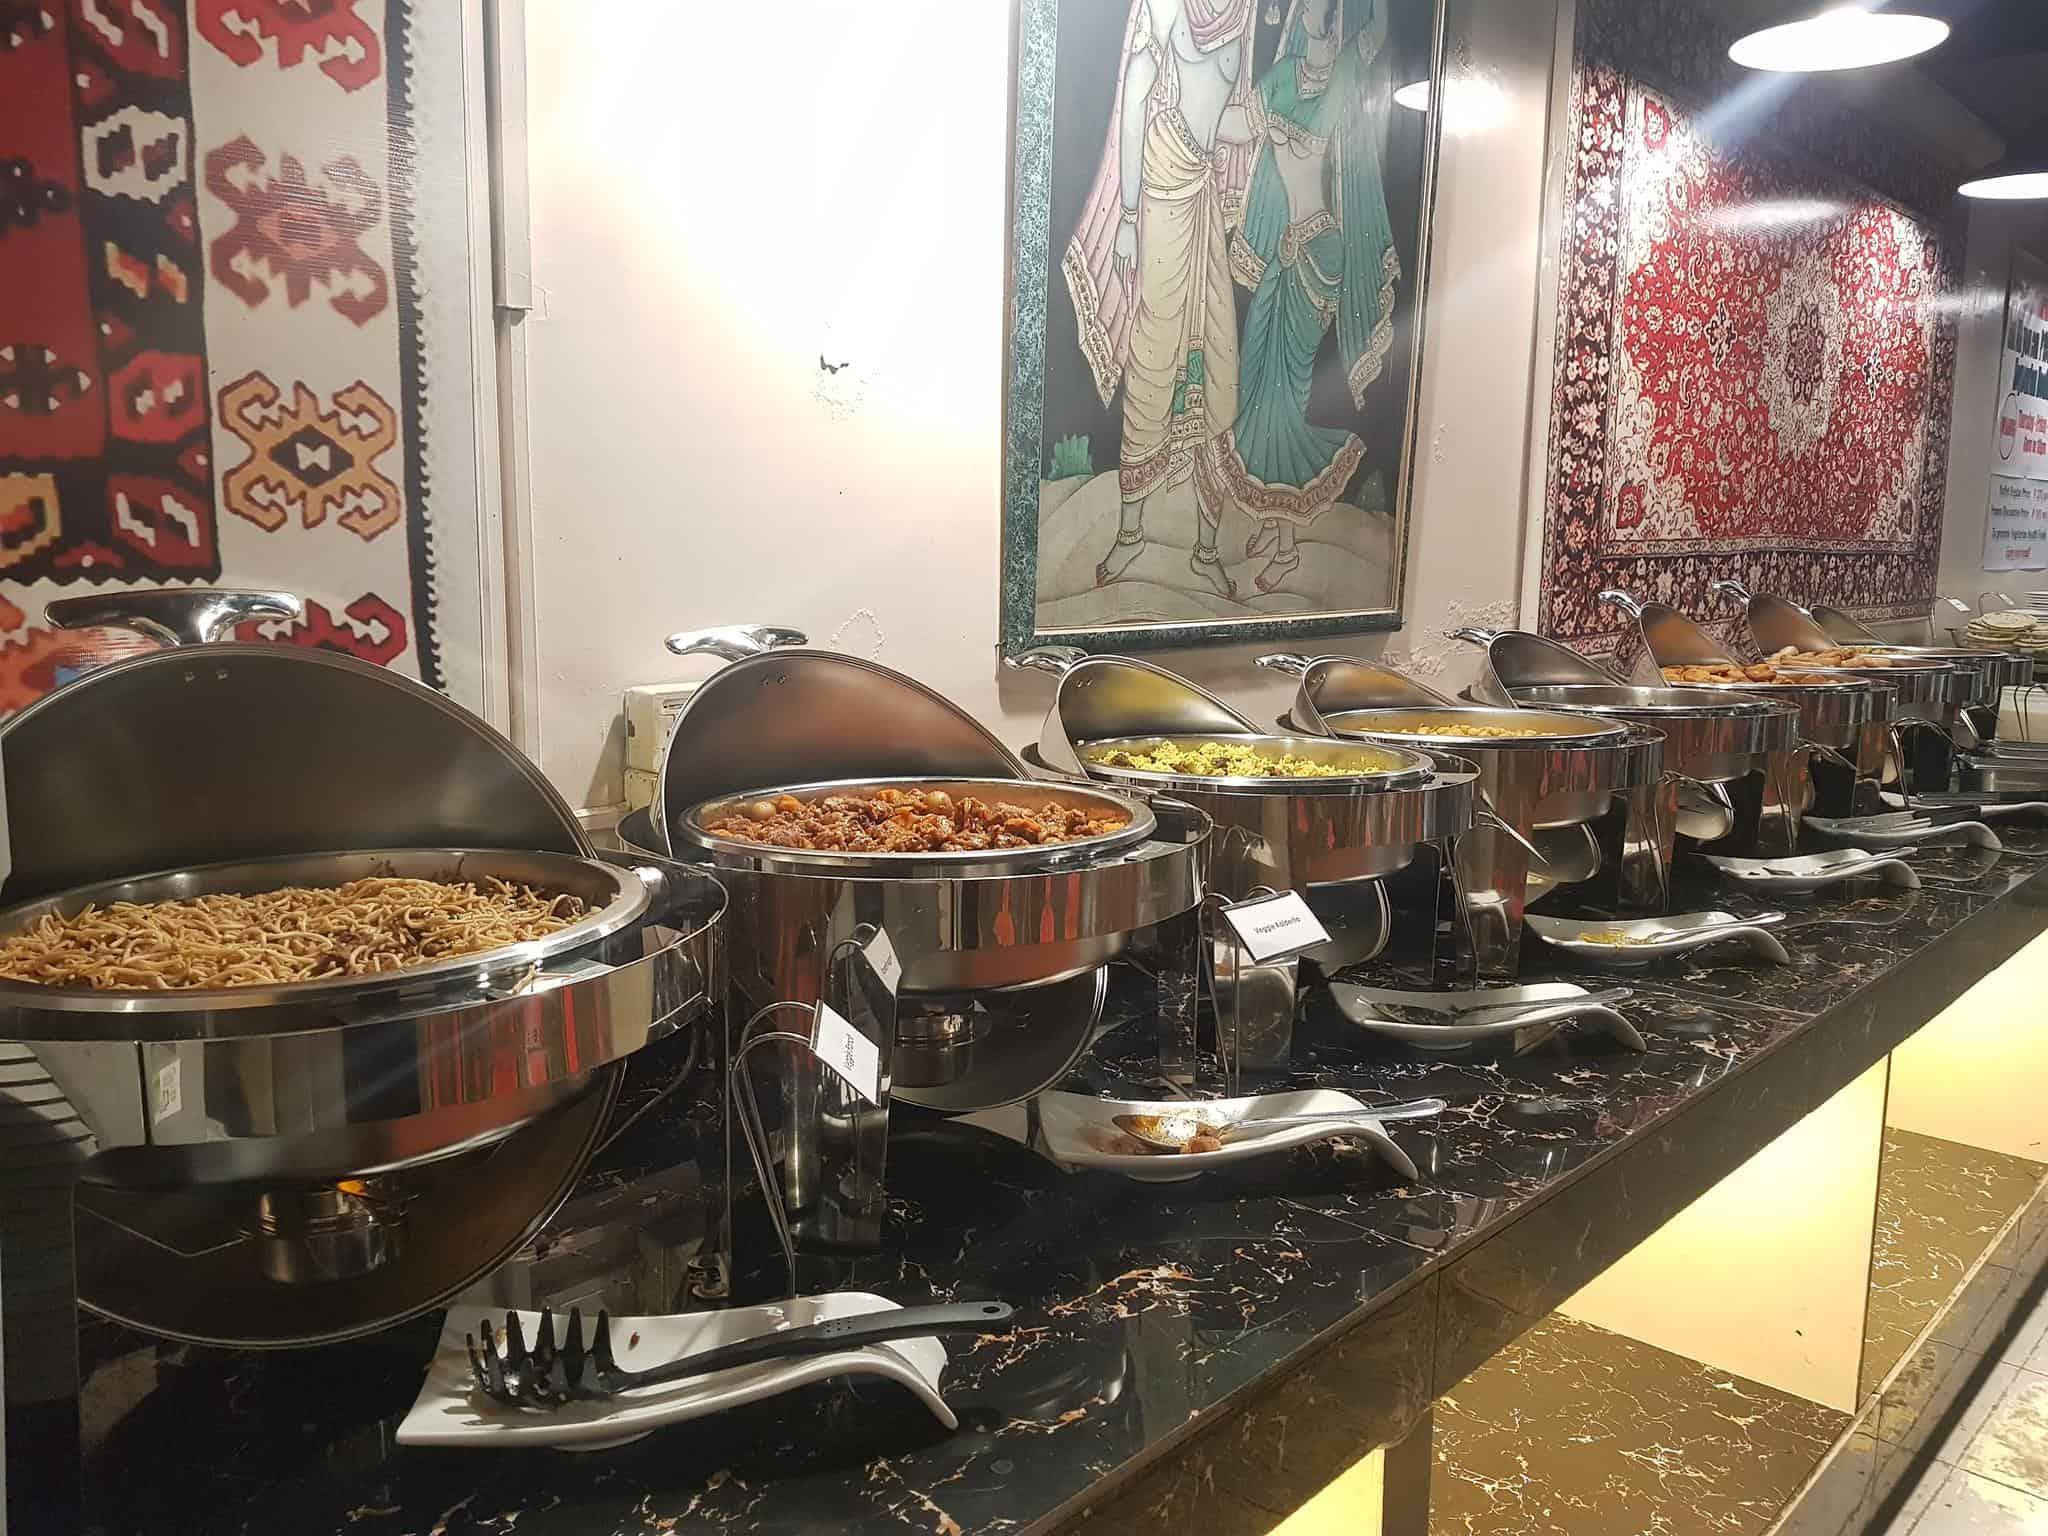 Persian Palate Cebu Eat All You Can Unli Vege (10)